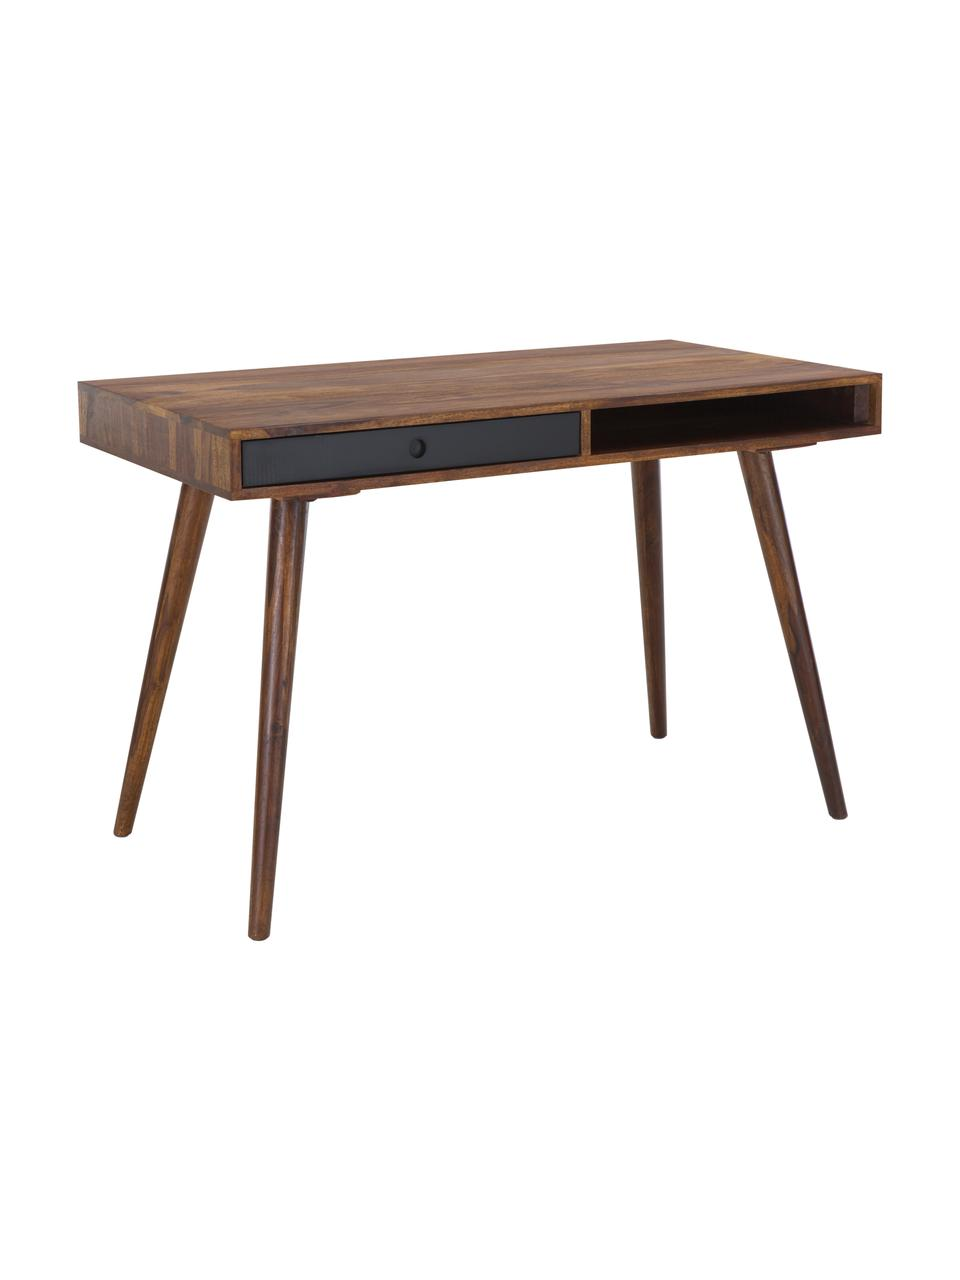 Biurko z litego drewna Repa, Drewno palisandrowe, lite, lakierowane, Drewno palisandrowe, czarny, S 117 x G 60 cm